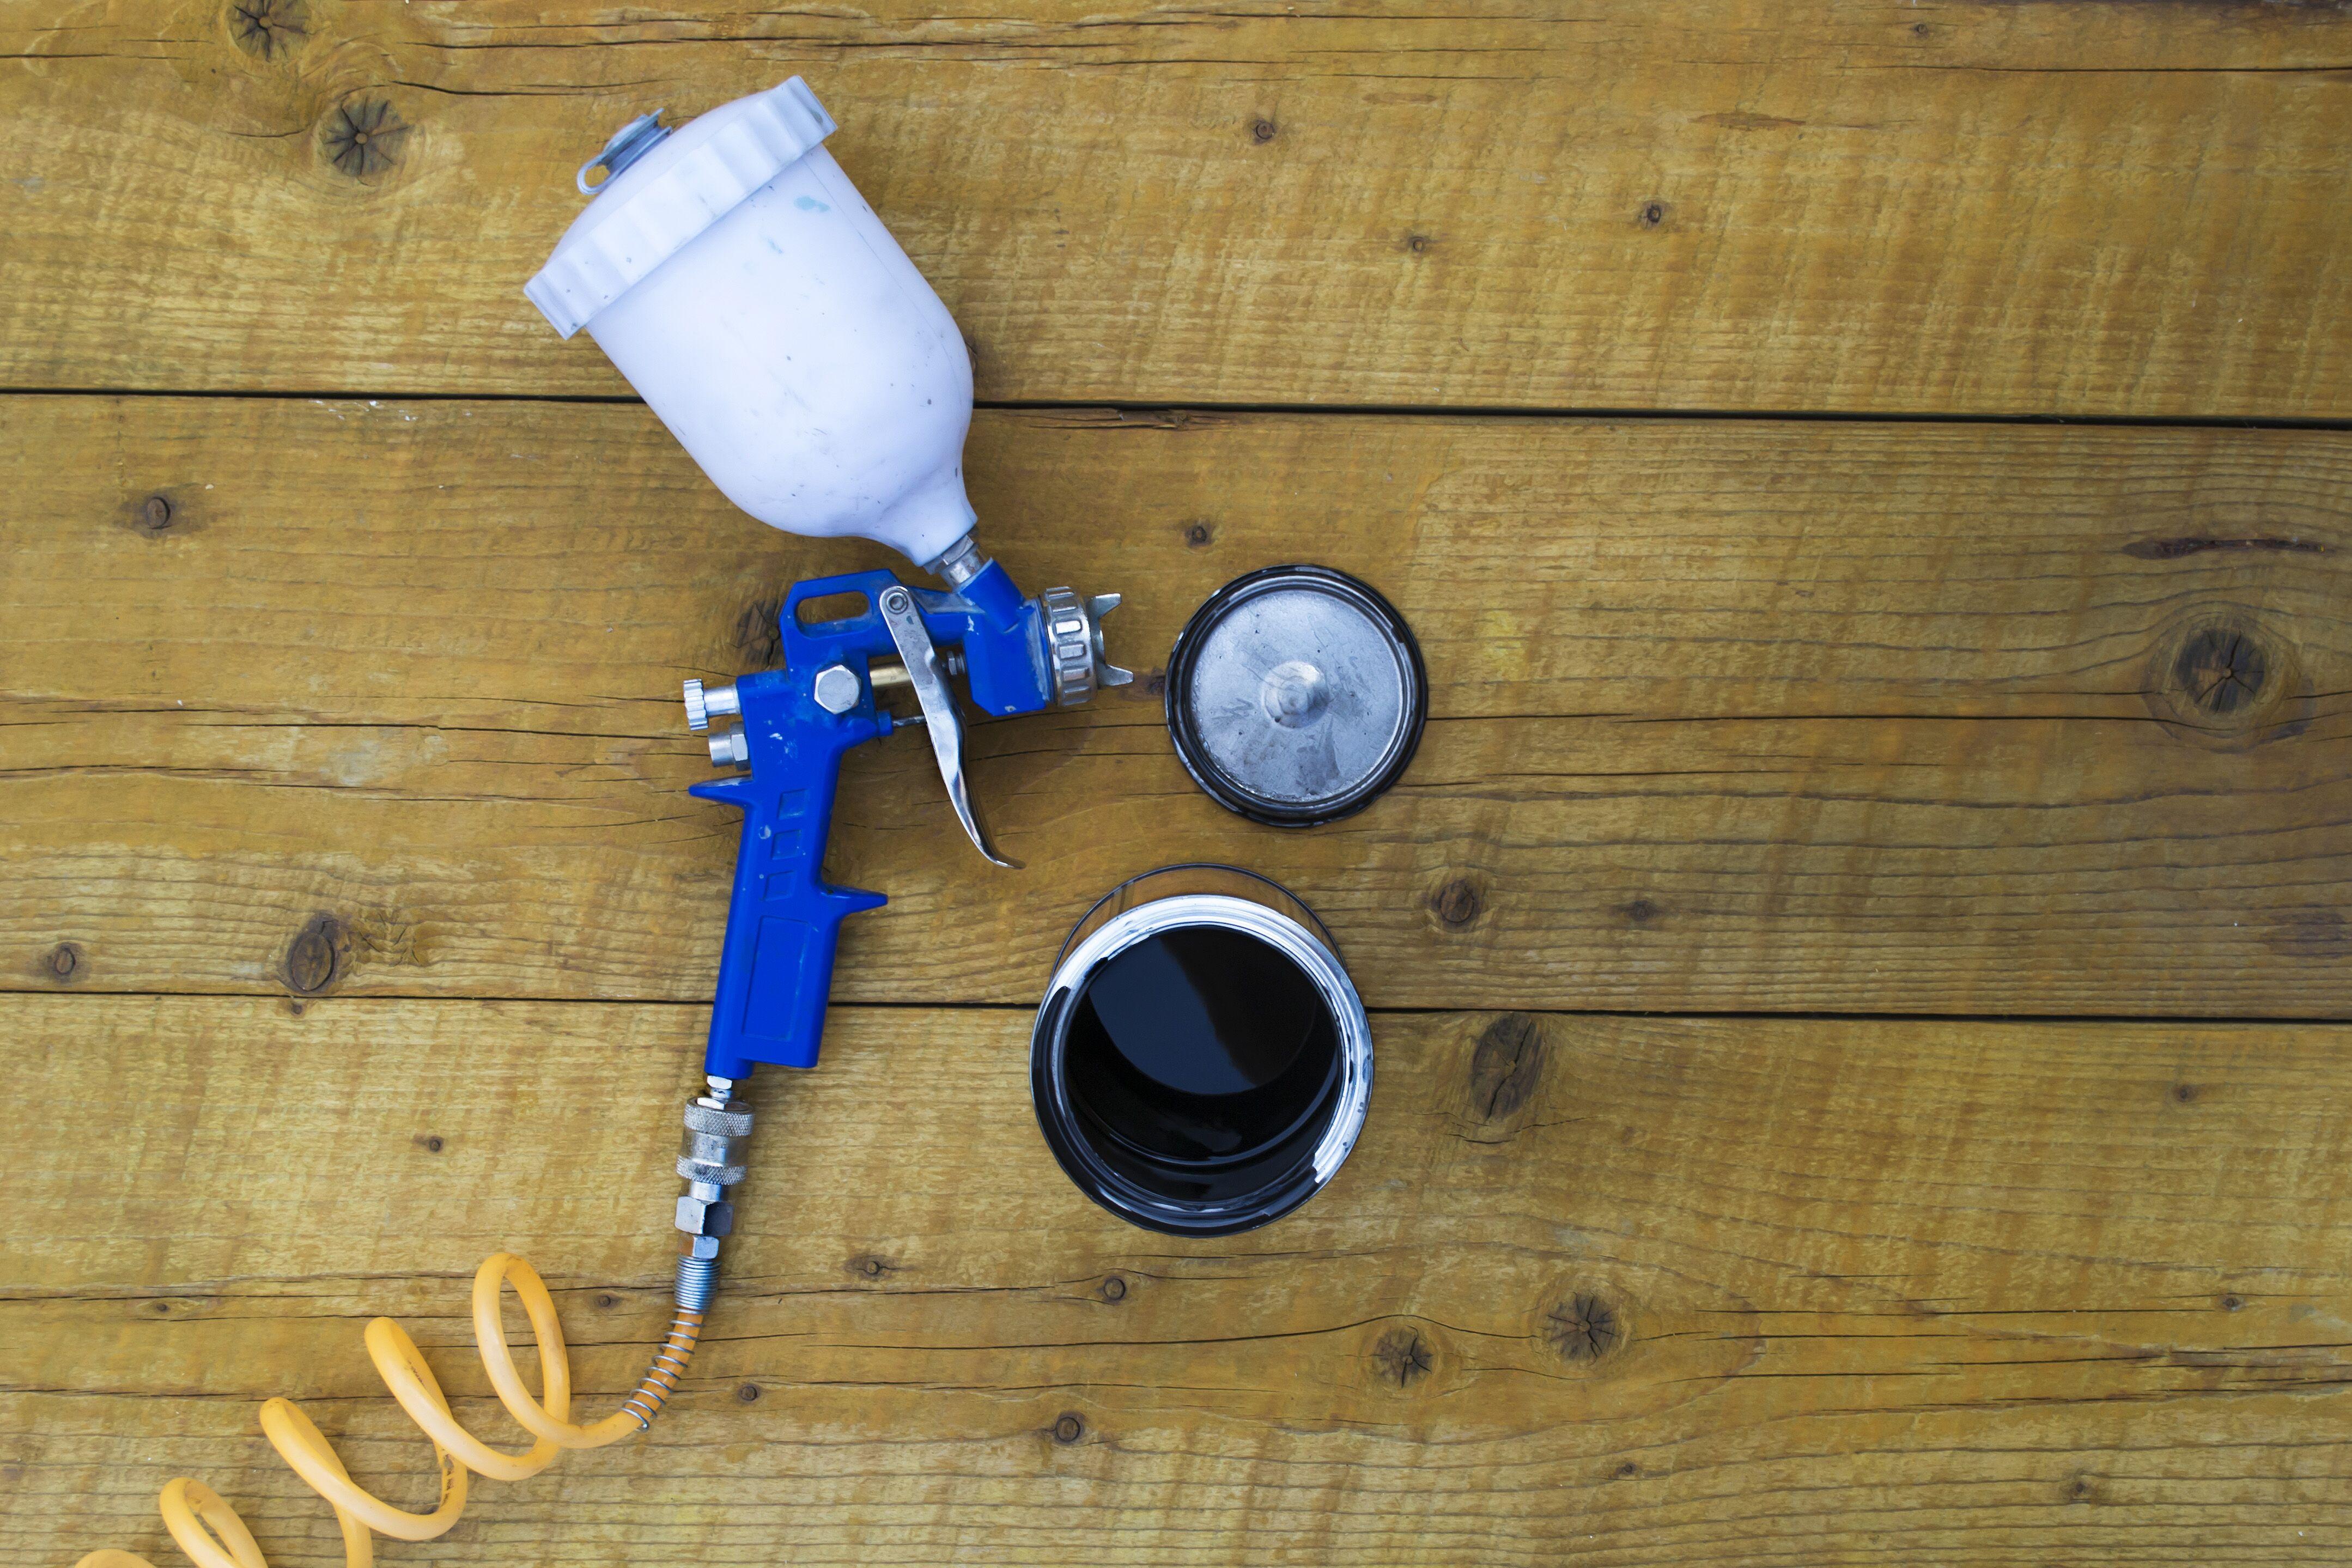 spray-painter-with-supplies.jpeg?mtime=20200220123438#asset:16533